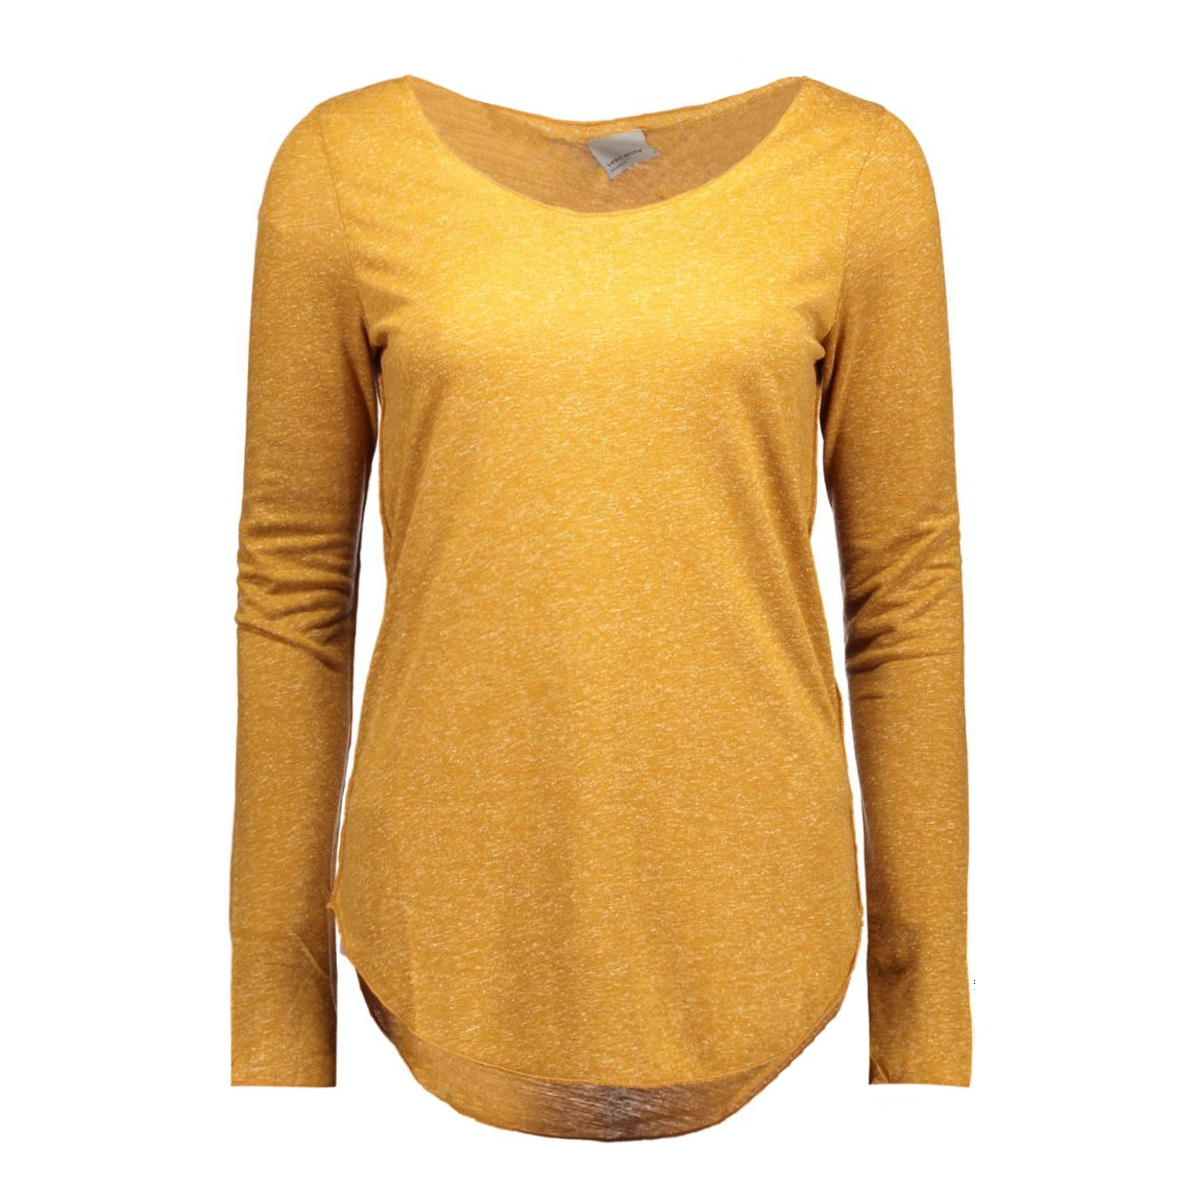 vmlua ls top noos 10158658 vero moda t-shirt cathay spice